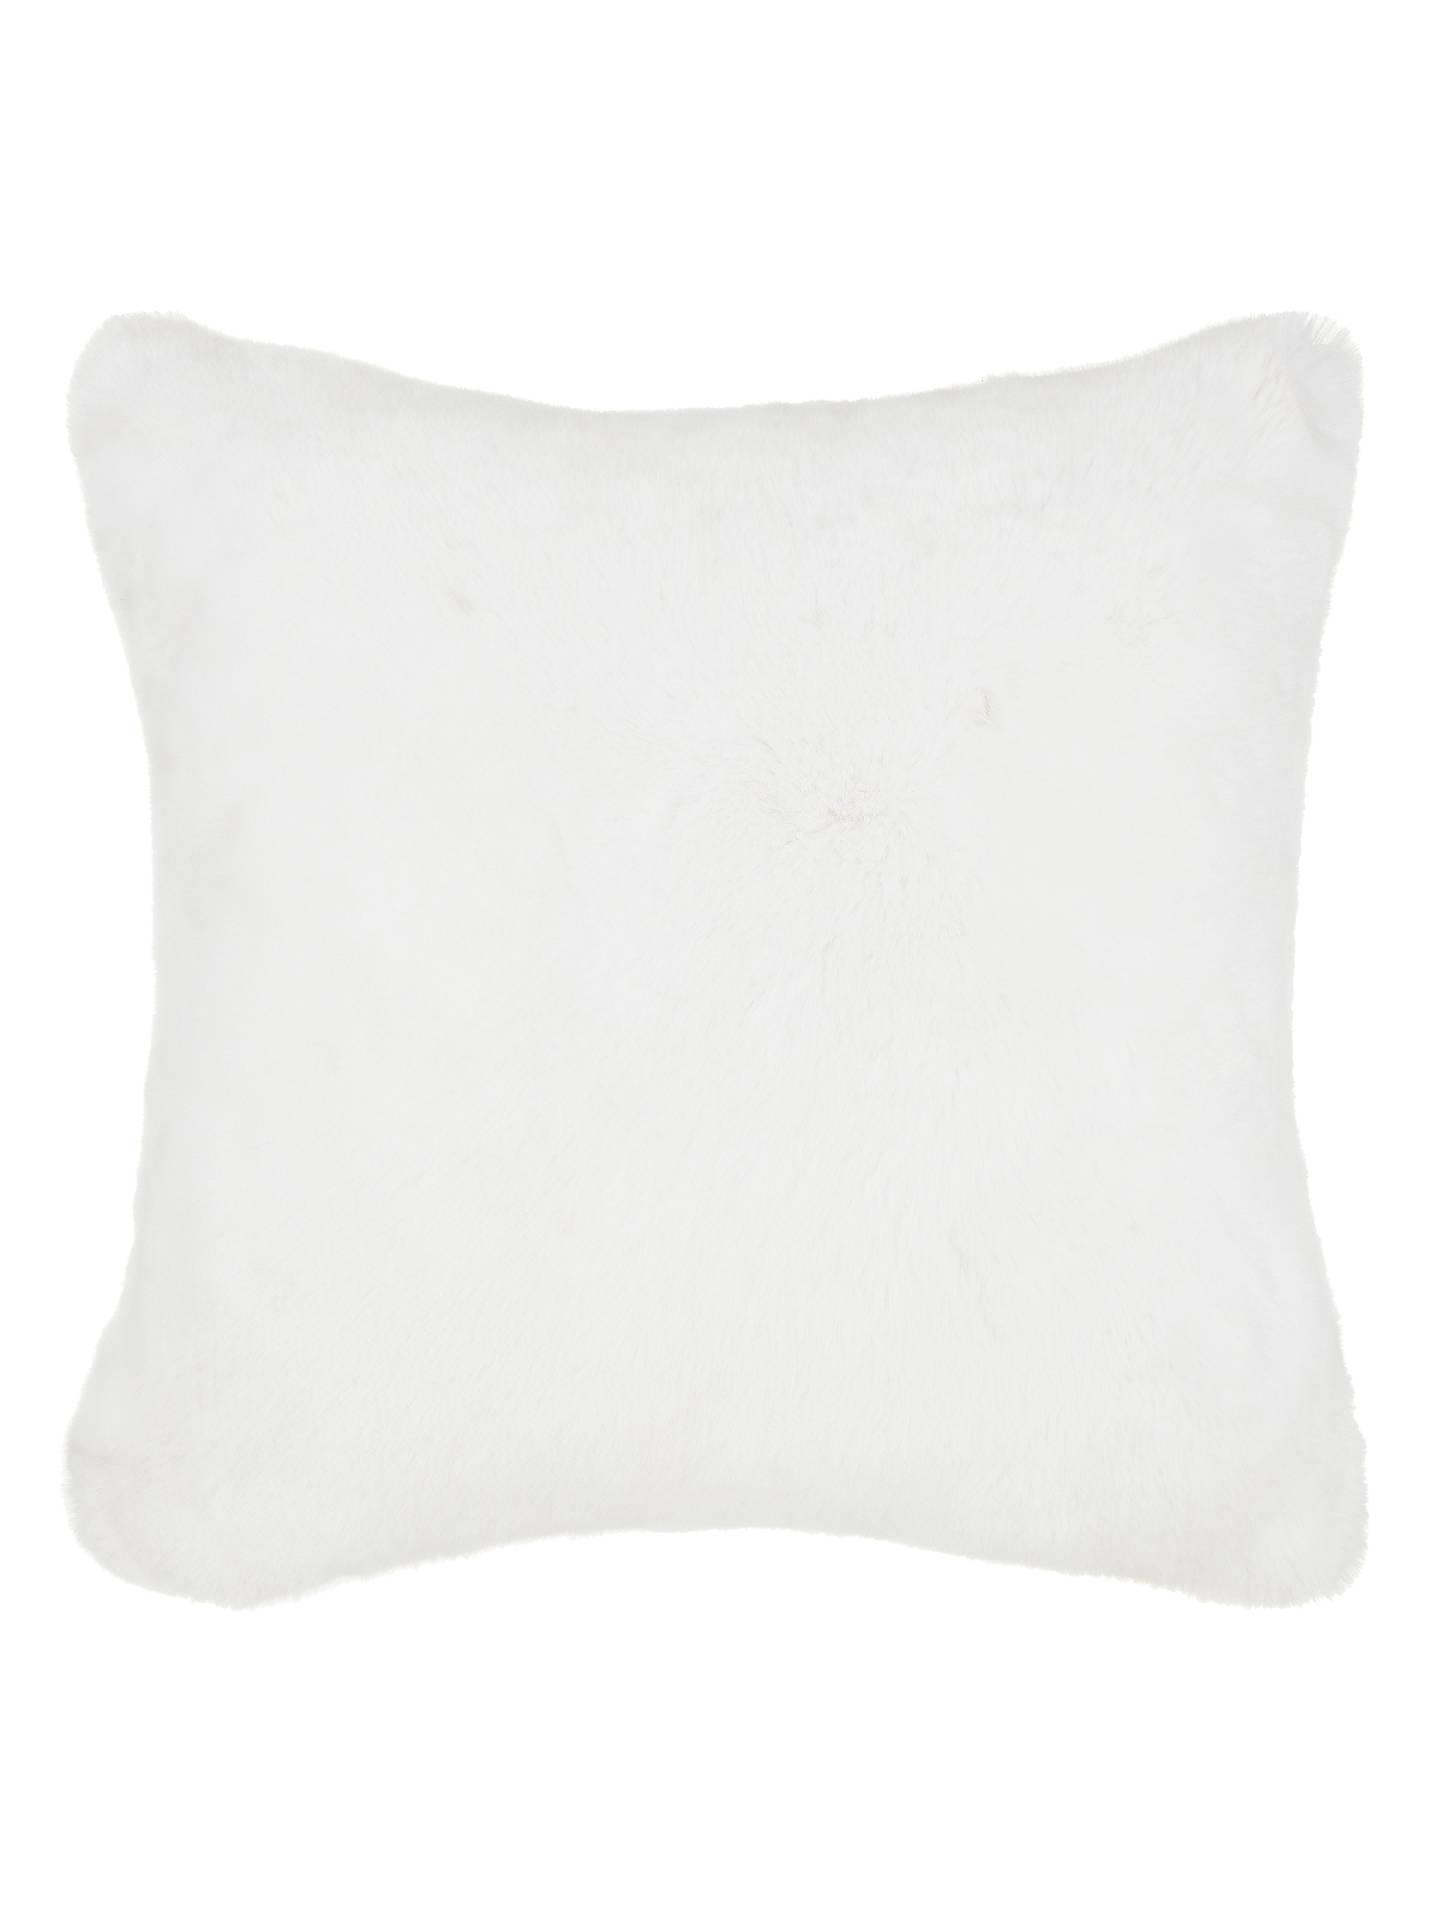 john lewis partners soft faux fur large cushion at john. Black Bedroom Furniture Sets. Home Design Ideas